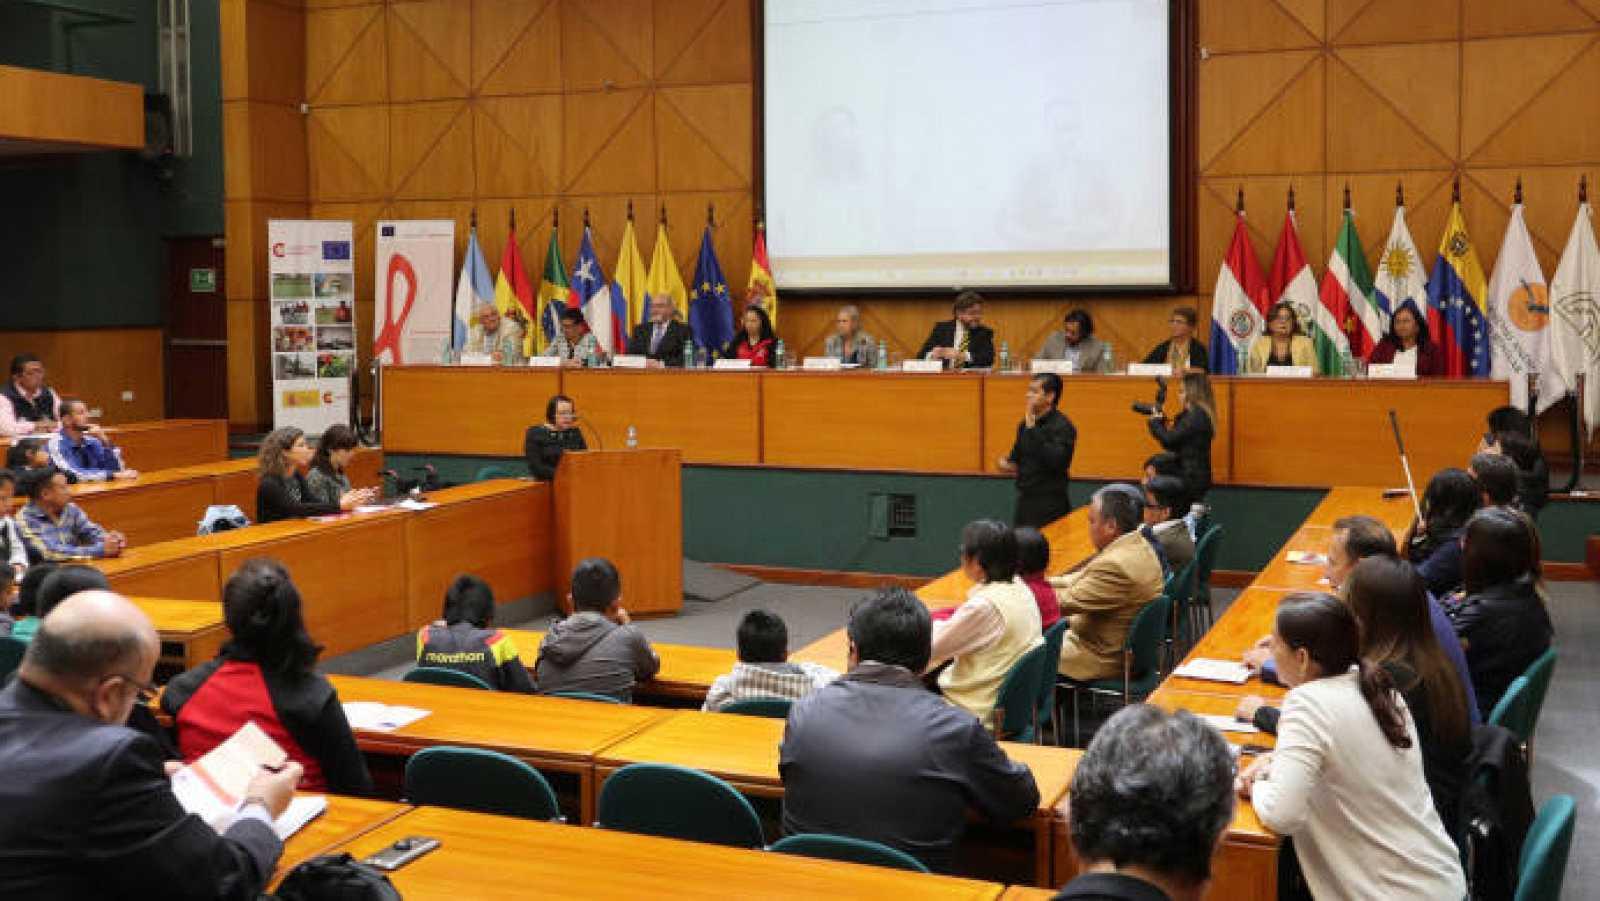 Marca España - Educación inclusiva en Ecuador  - escuchar ahora